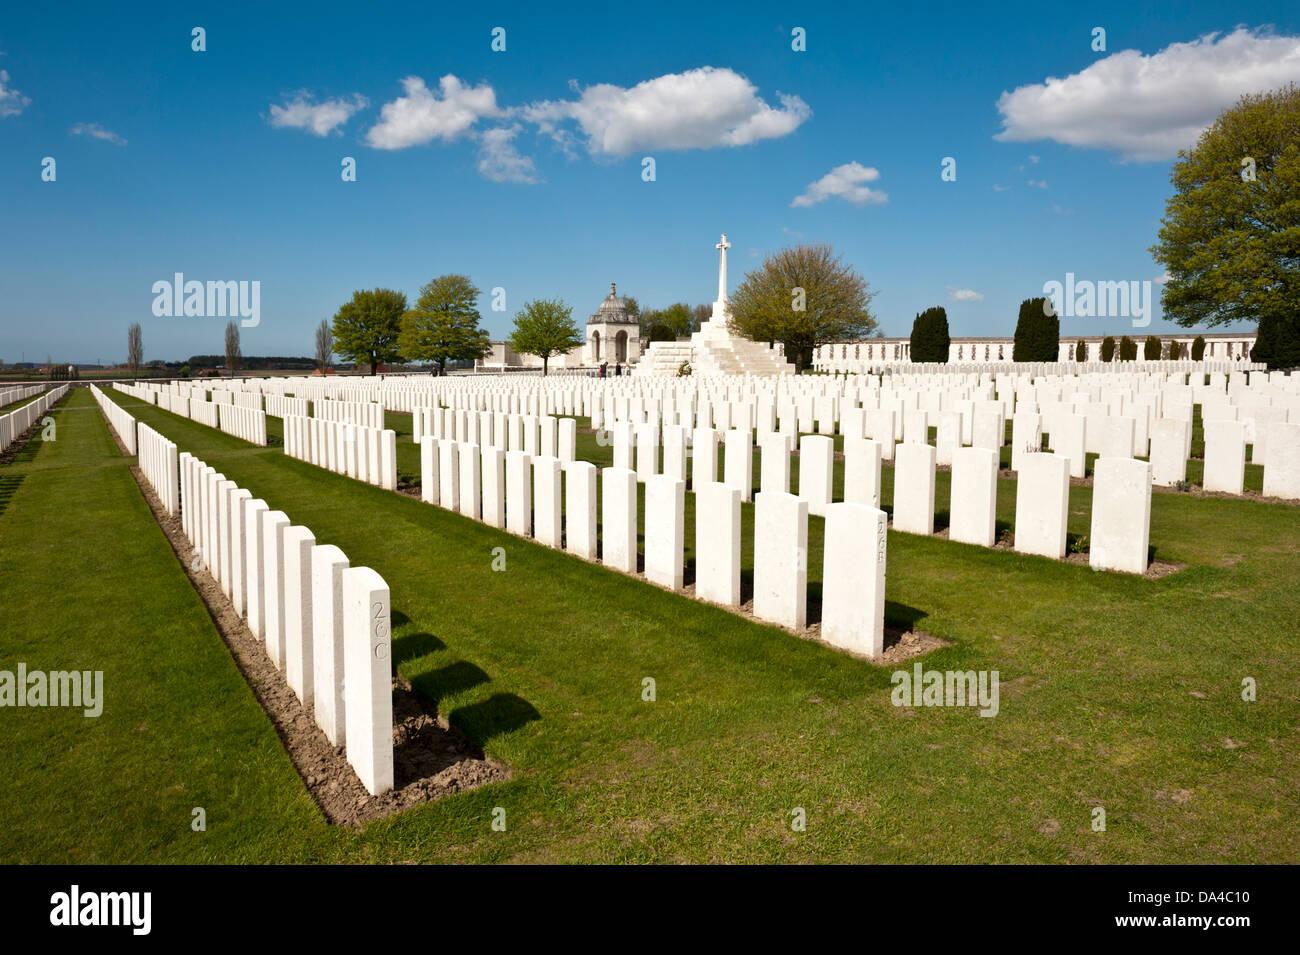 Tyne Cot, Commonwealth War Graves Cemetery,Ypres, Belgium. - Stock Image